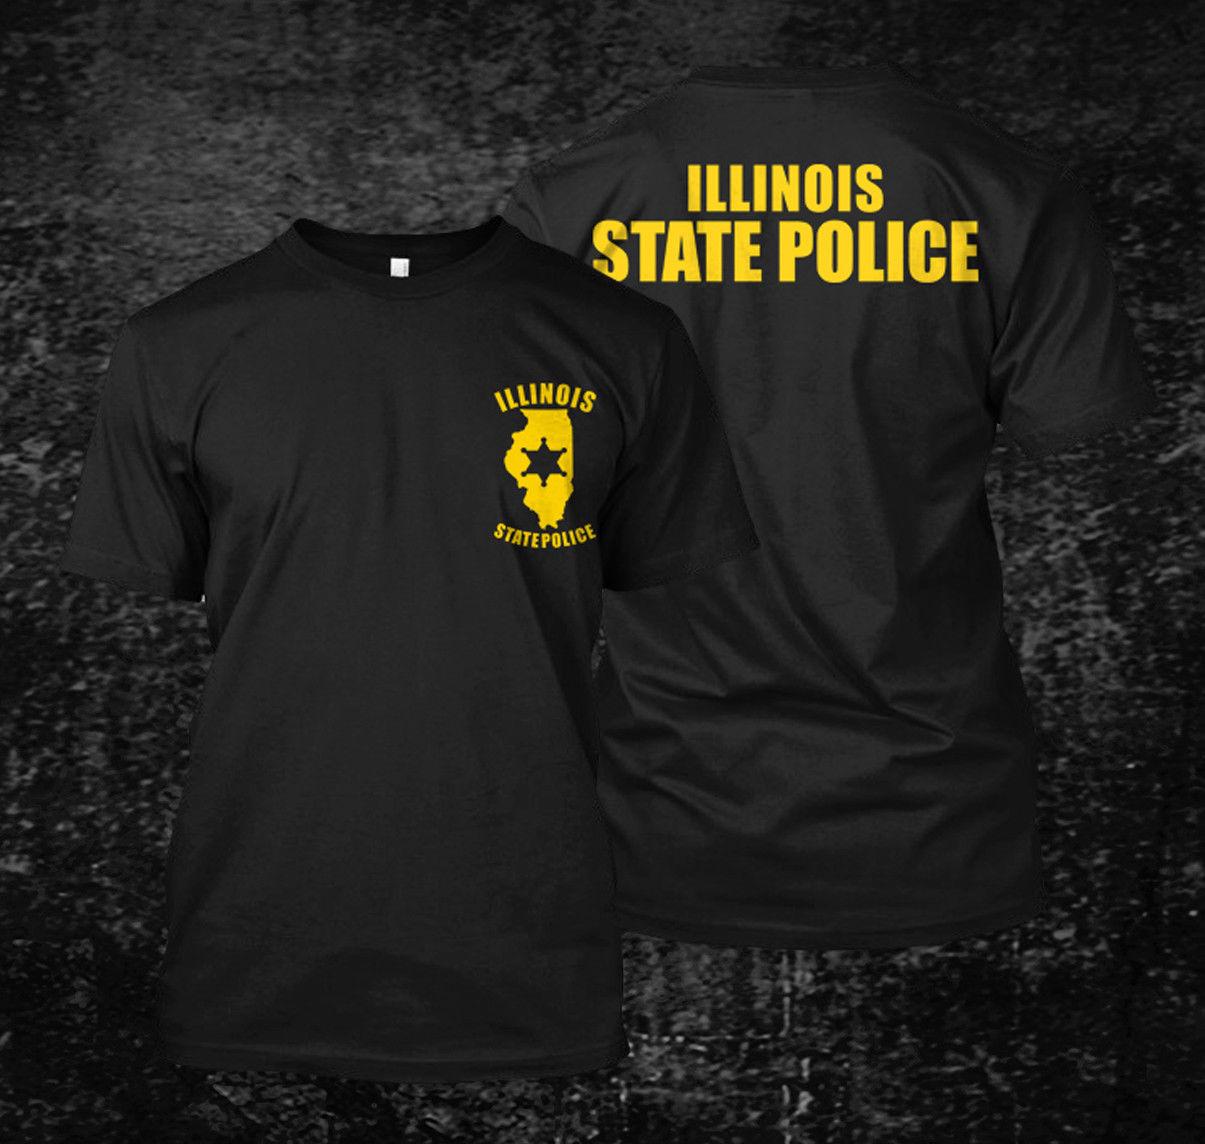 Camisetas holgadas negras para hombre, camisetas para hombre, camisetas de la Policía Estatal de Illinois USA, camiseta personalizada para hombre, camiseta estampada para hombre